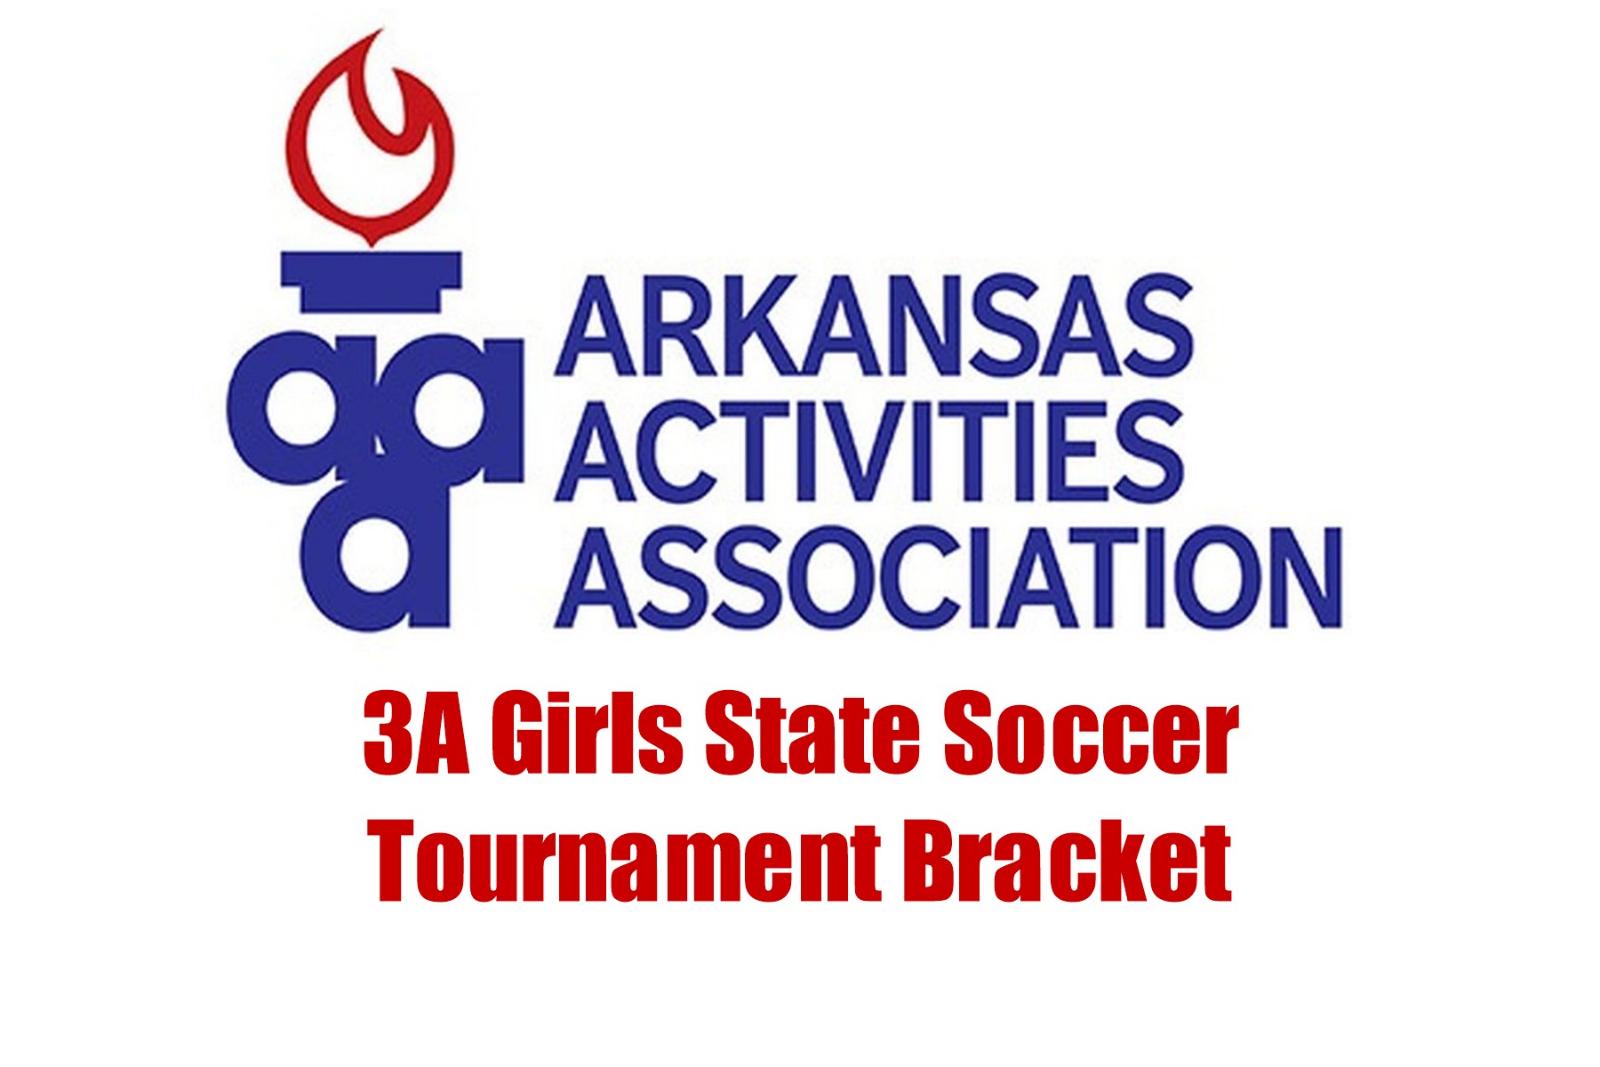 3A Girls State Soccer Tournament bracket